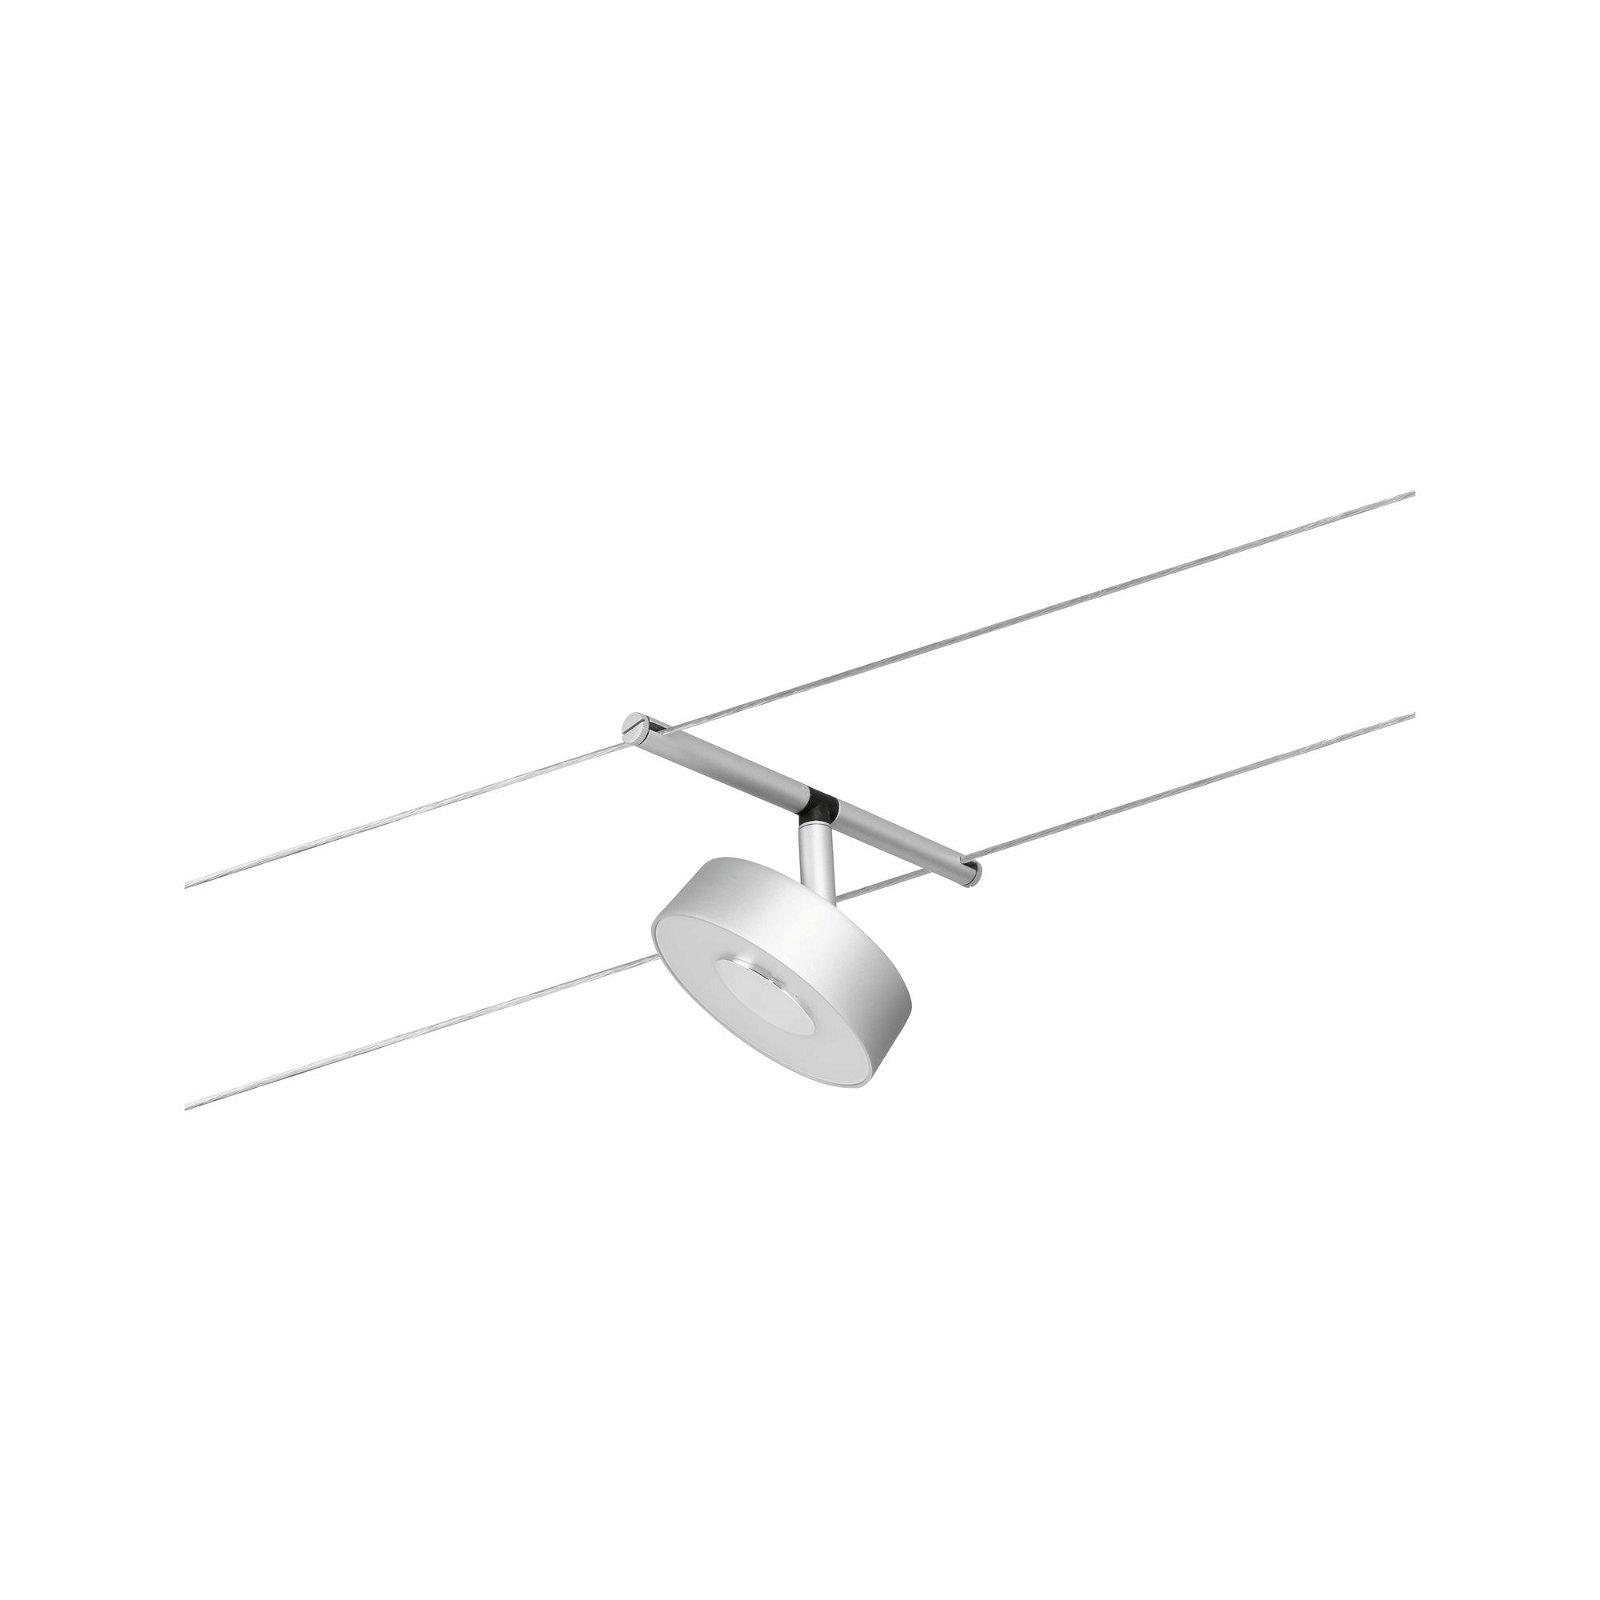 LED Seilsystem Circle Einzelspot 400lm 5W 3000K 12V Chrom matt/Chrom